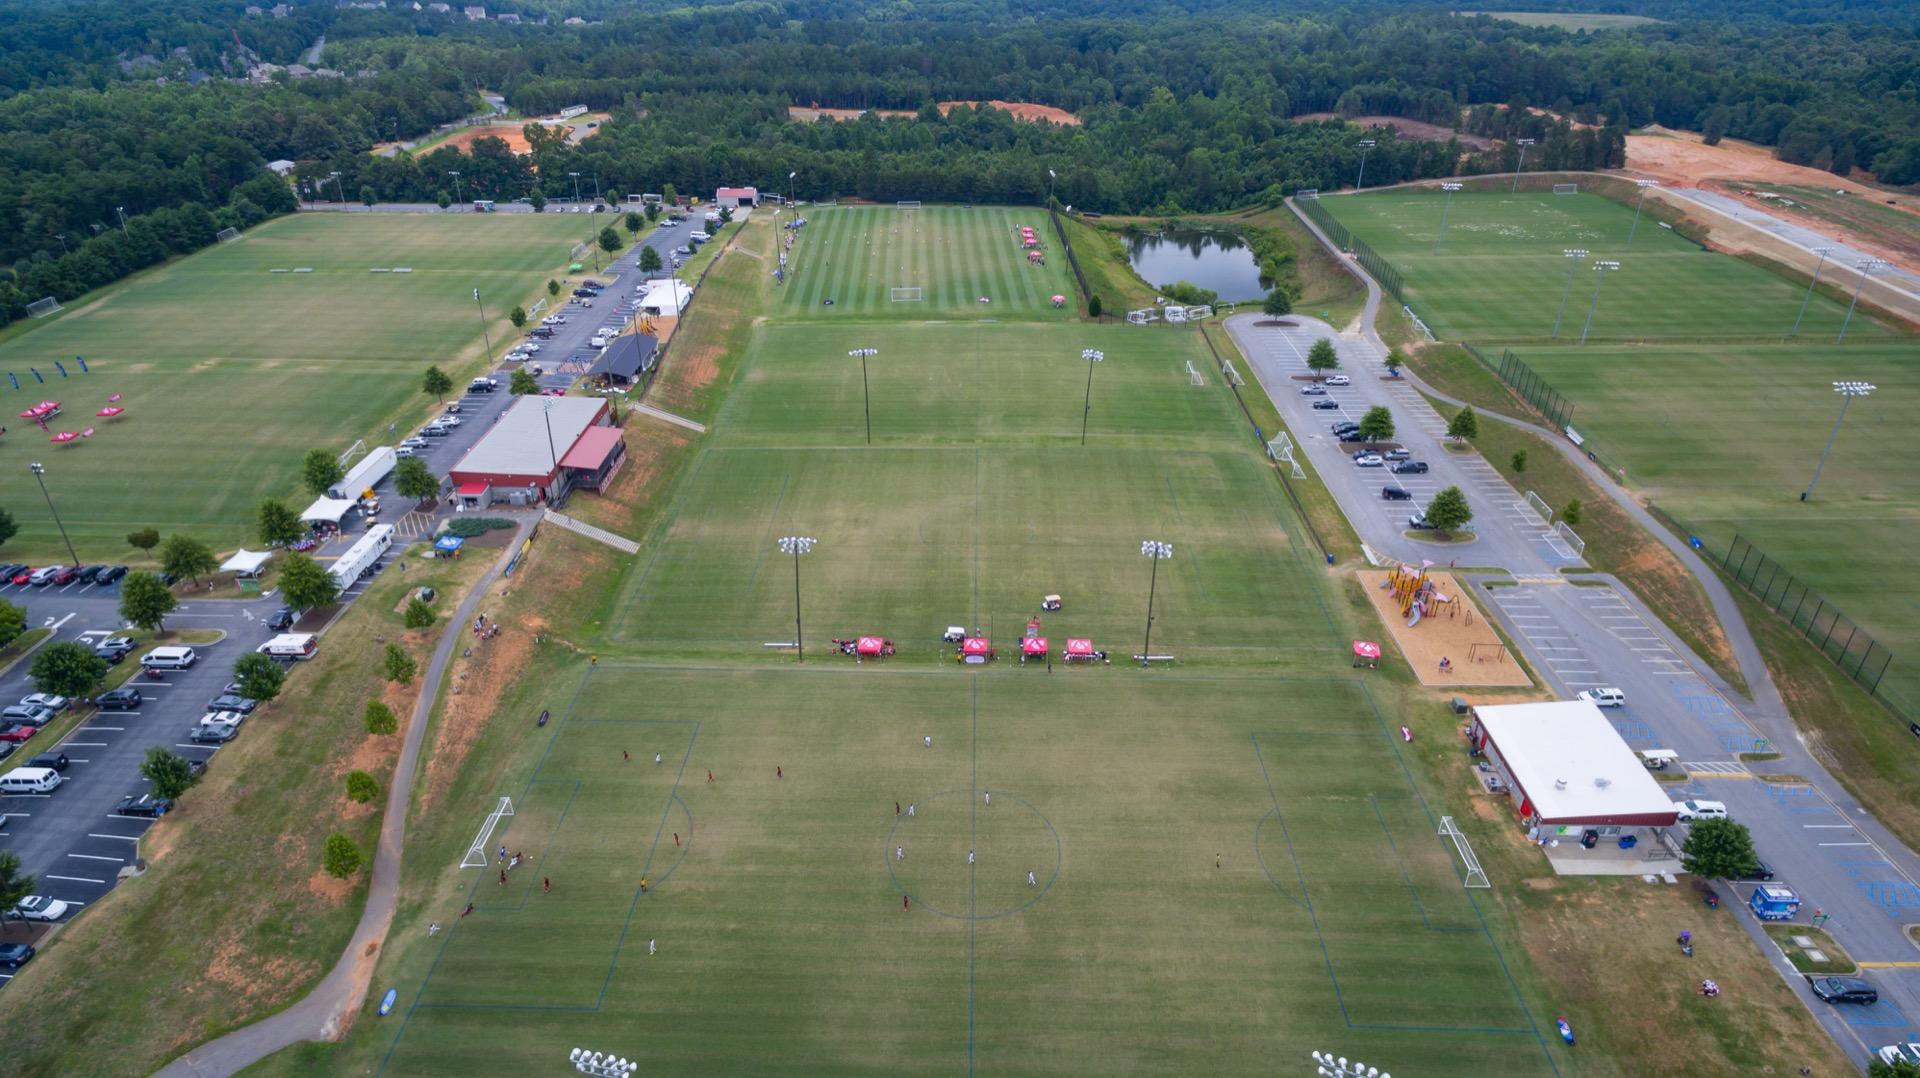 mesa soccer complex aerial view